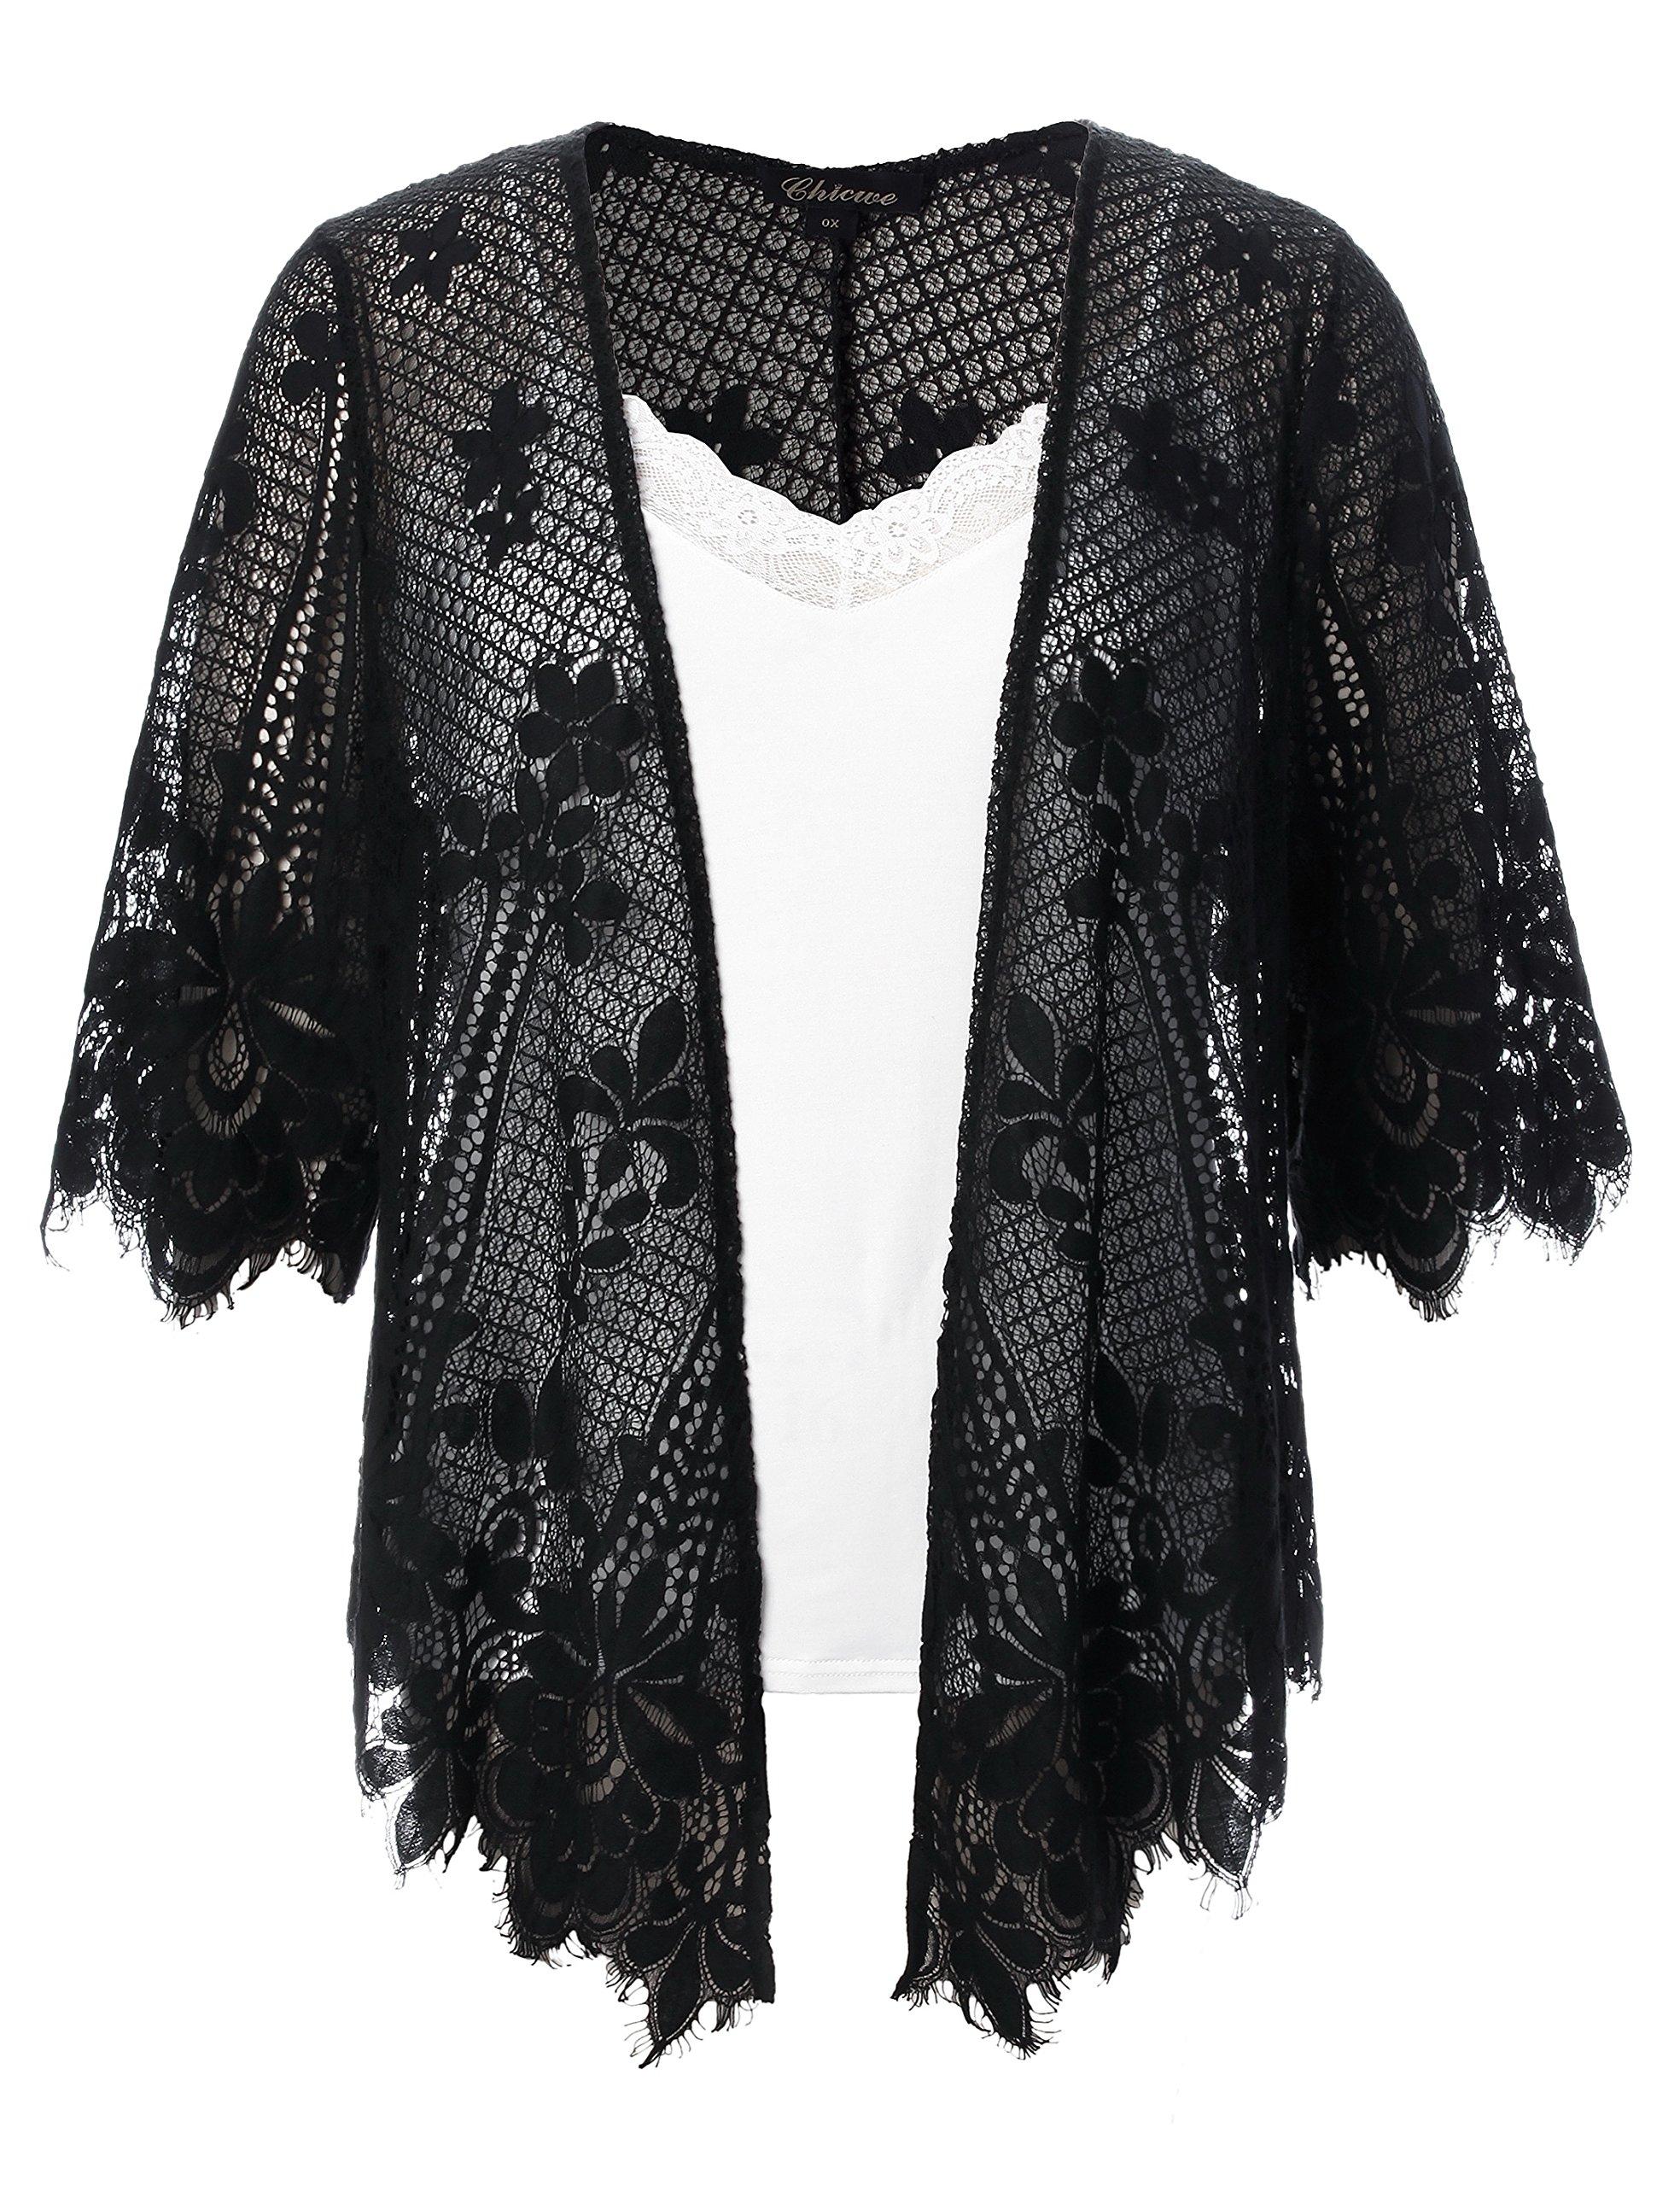 Chicwe Women's Plus Size Scalloped Lace Kimono Lace Cover Up Top Black 4X